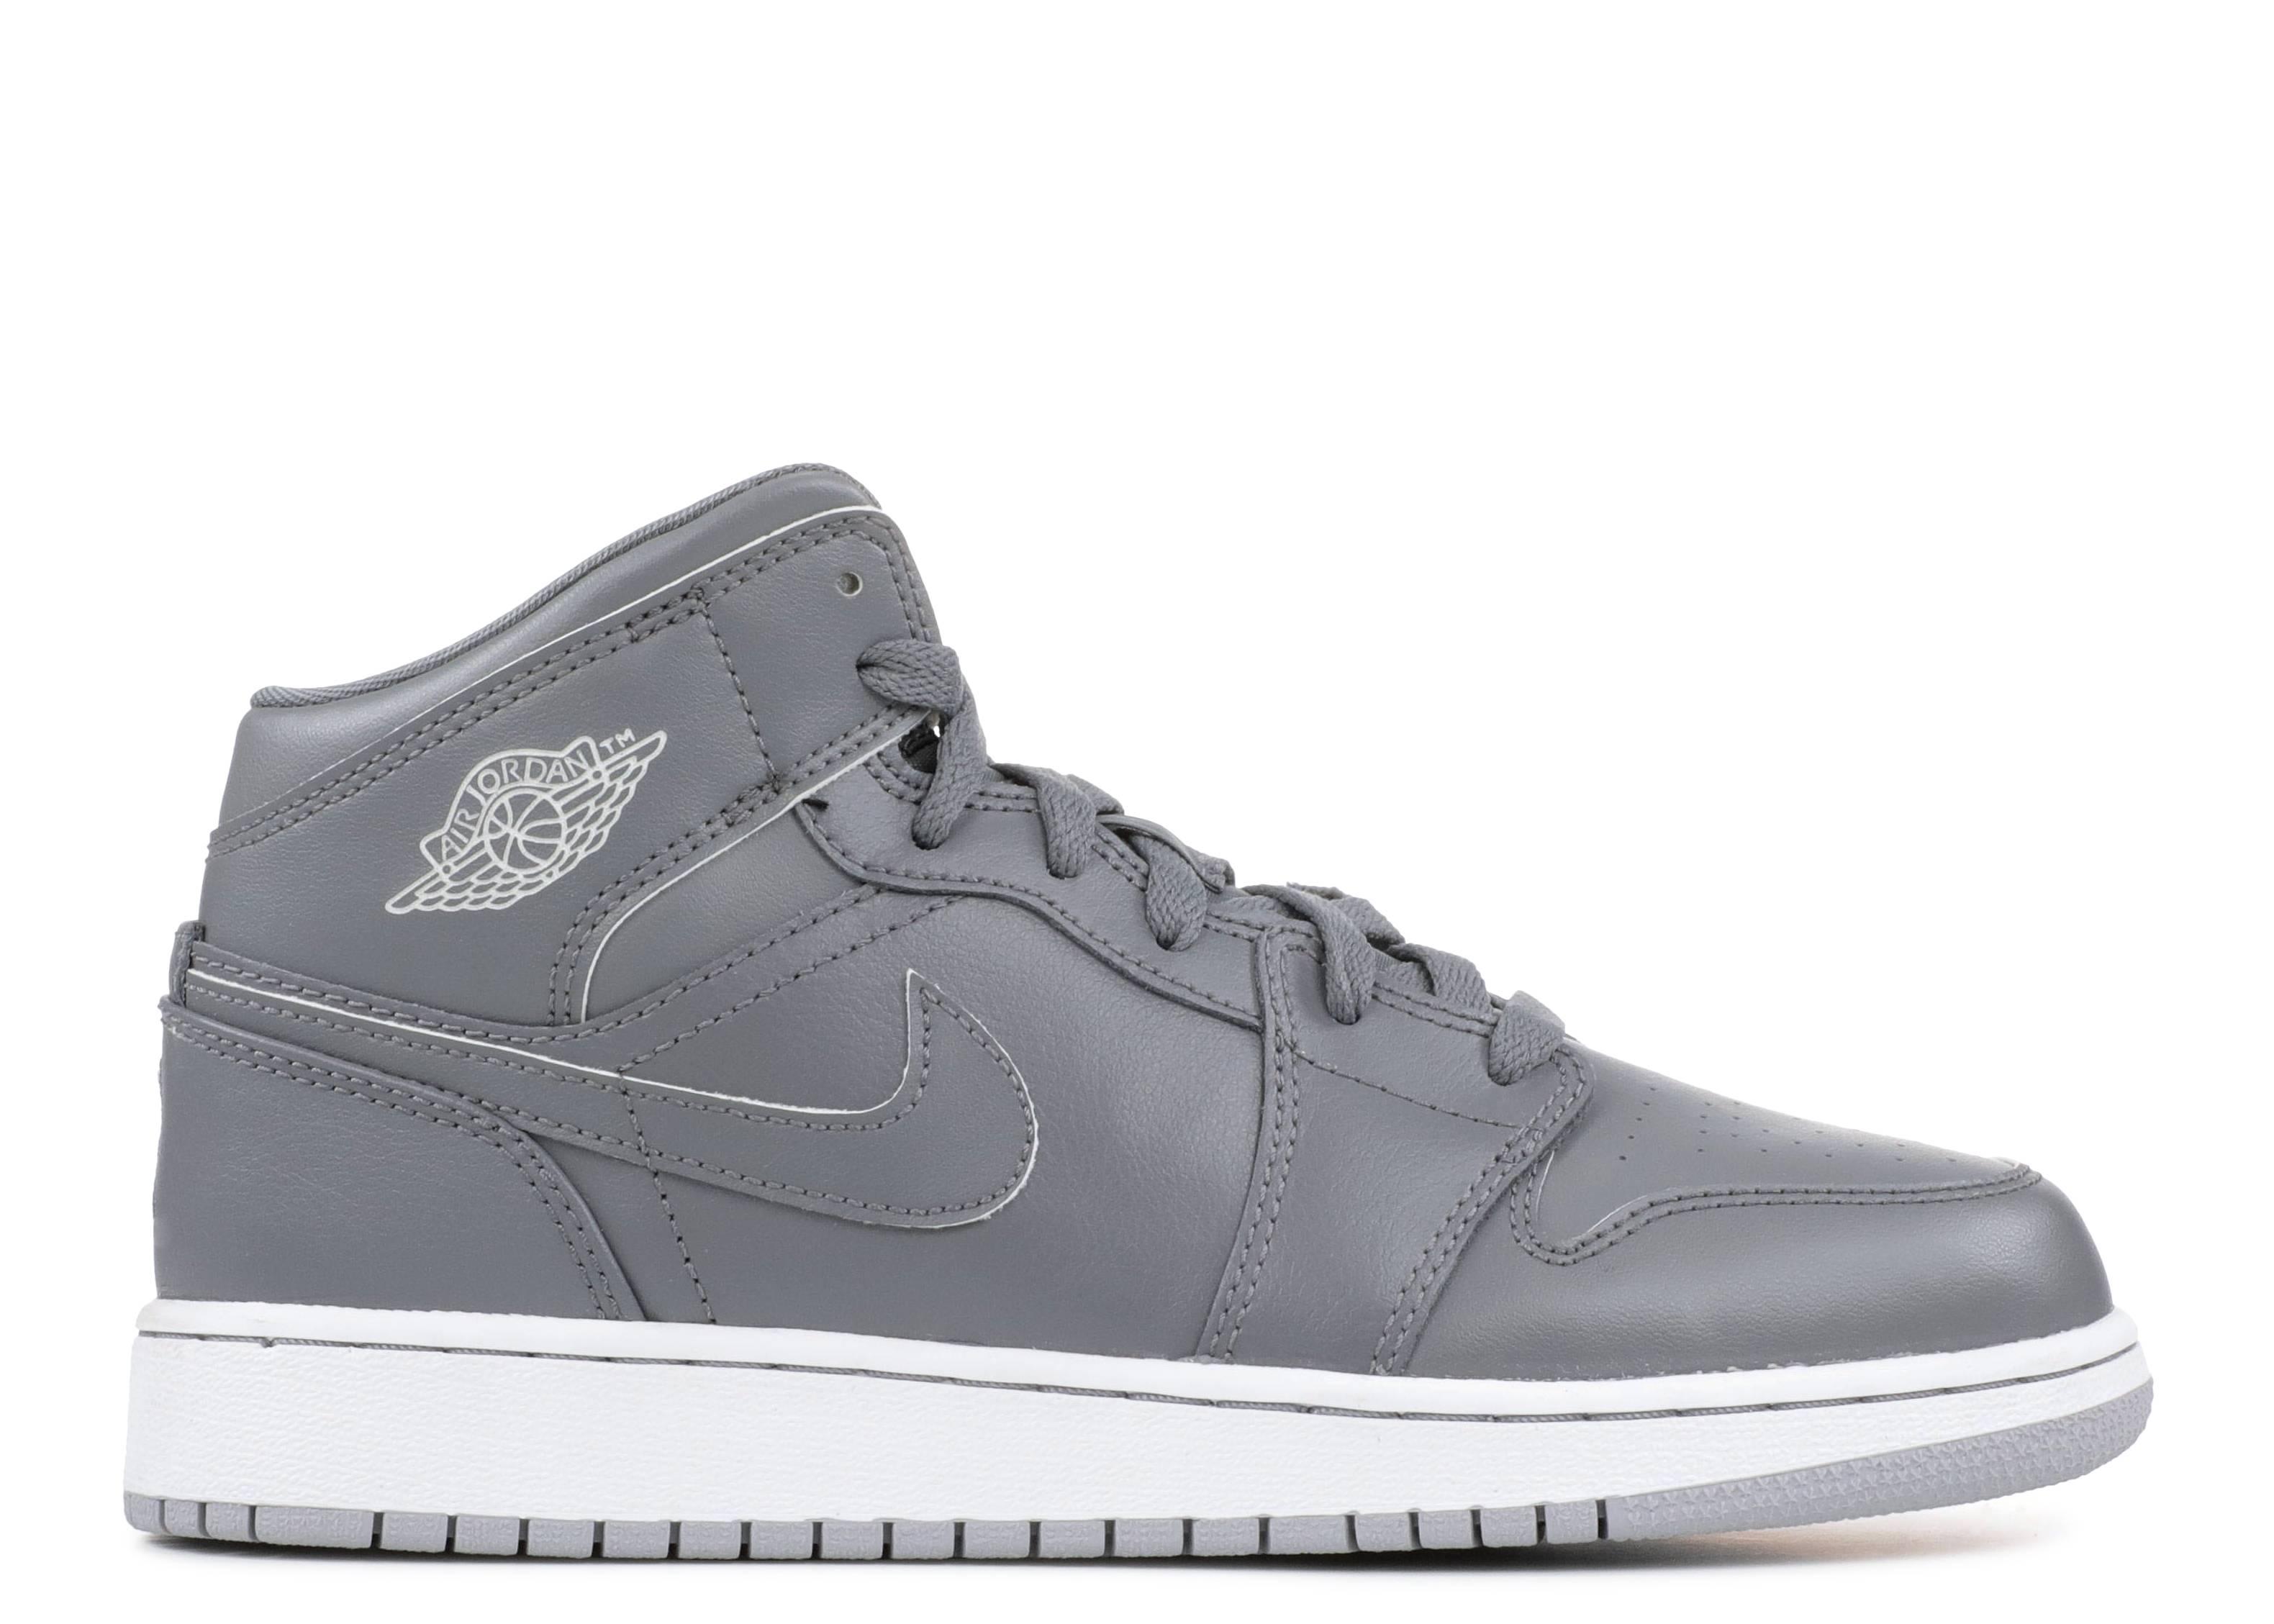 fa704cc62056 Air Jordan 1 Mid Bg - Air Jordan - 554725 031 - cool grey white-wolf grey